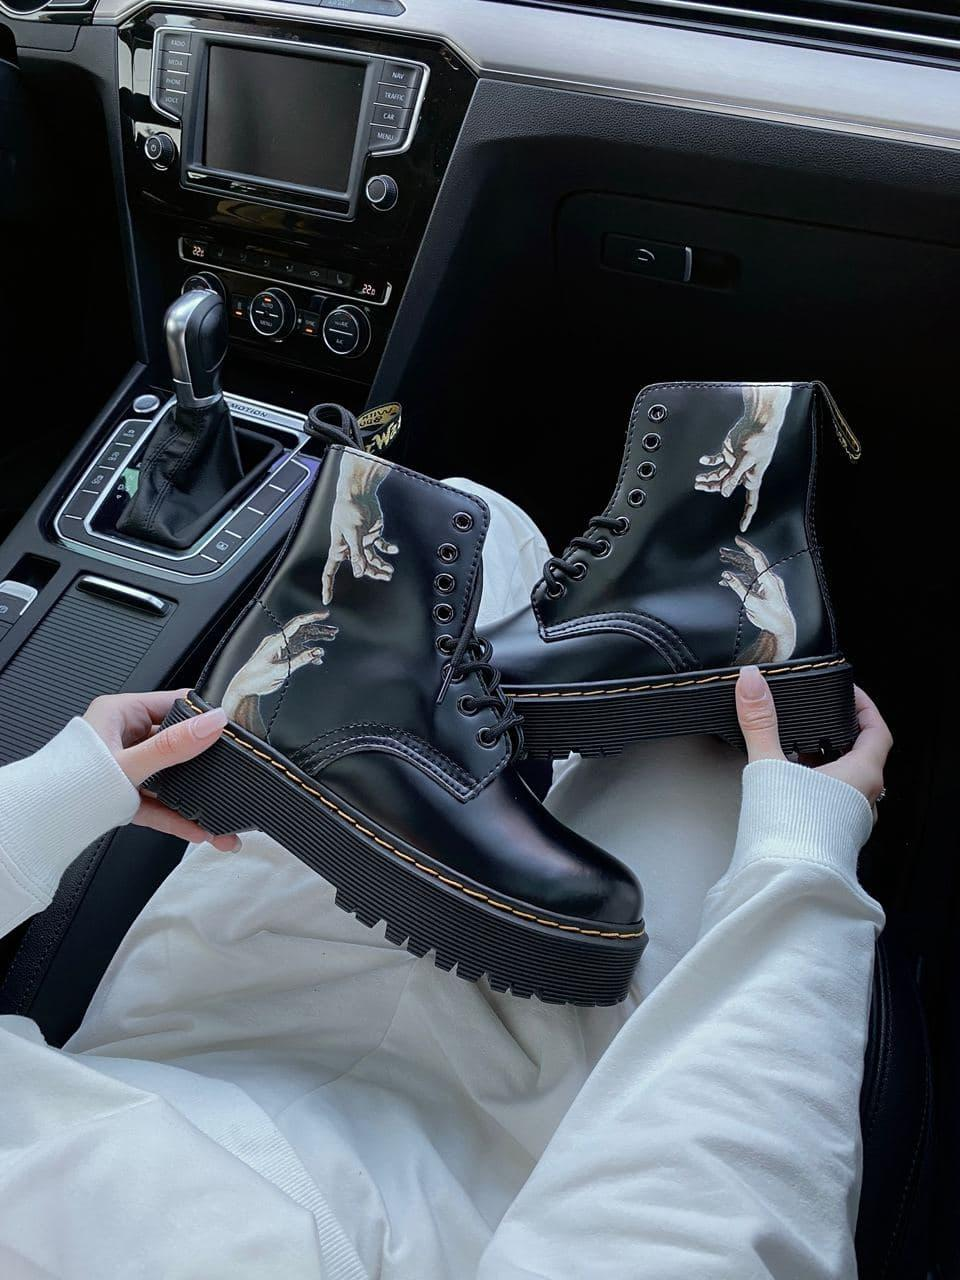 Демисезонные ботинки DR Martens / Доктор Мартинс / Руки Микеланджело